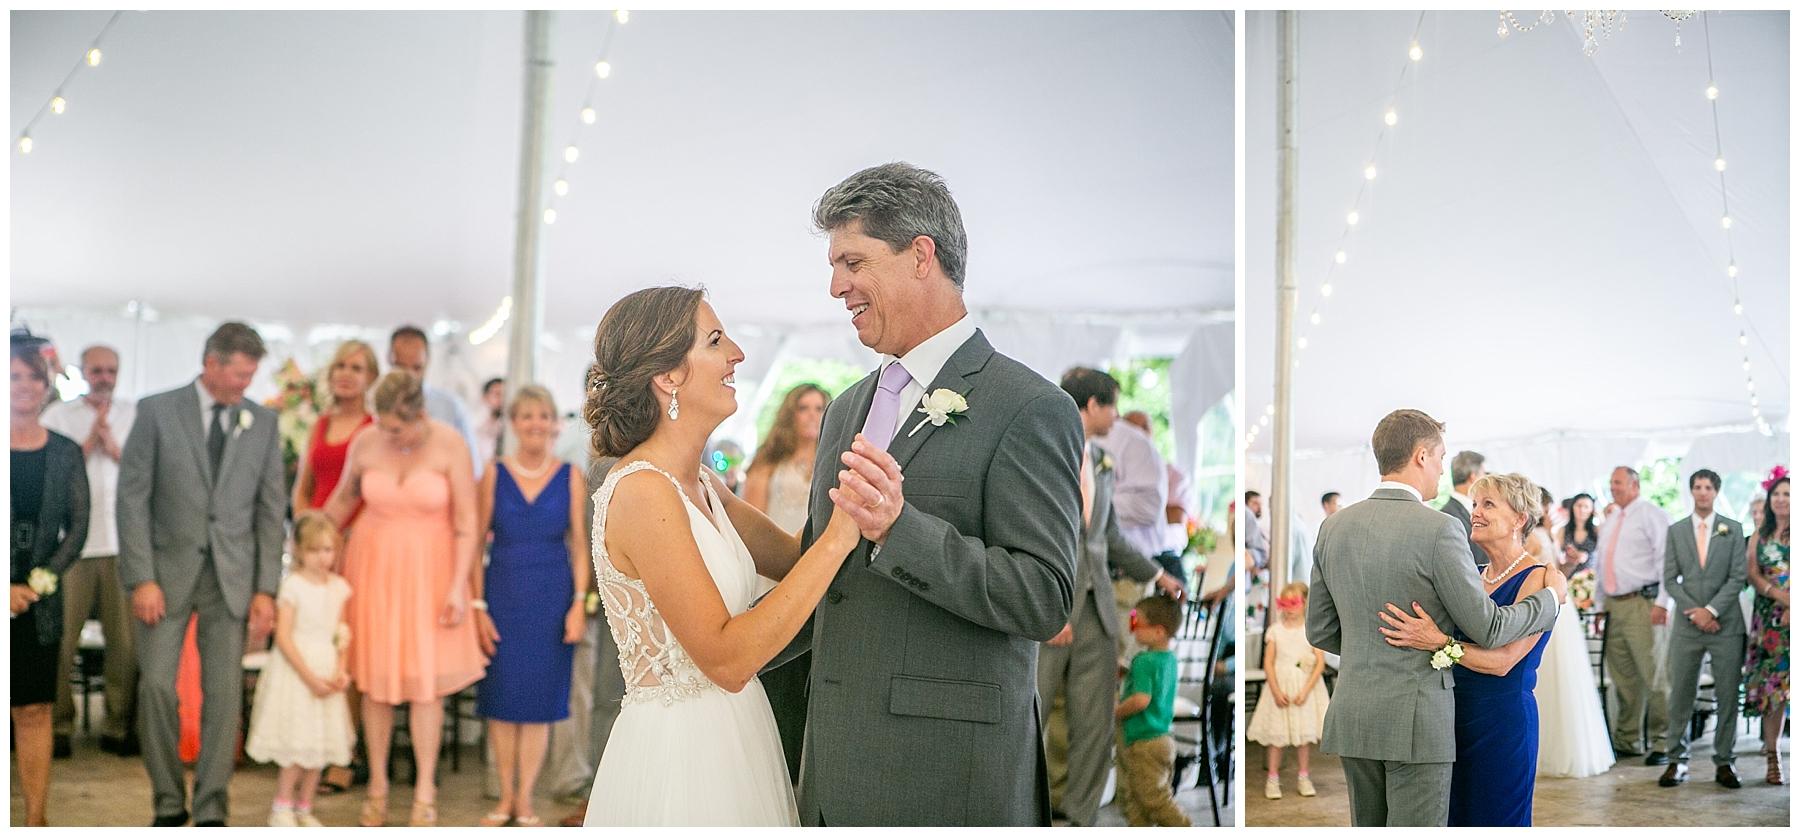 Chelsea Phil Bohemia River Overlook Wedding Living Radiant Photography photos_0137.jpg